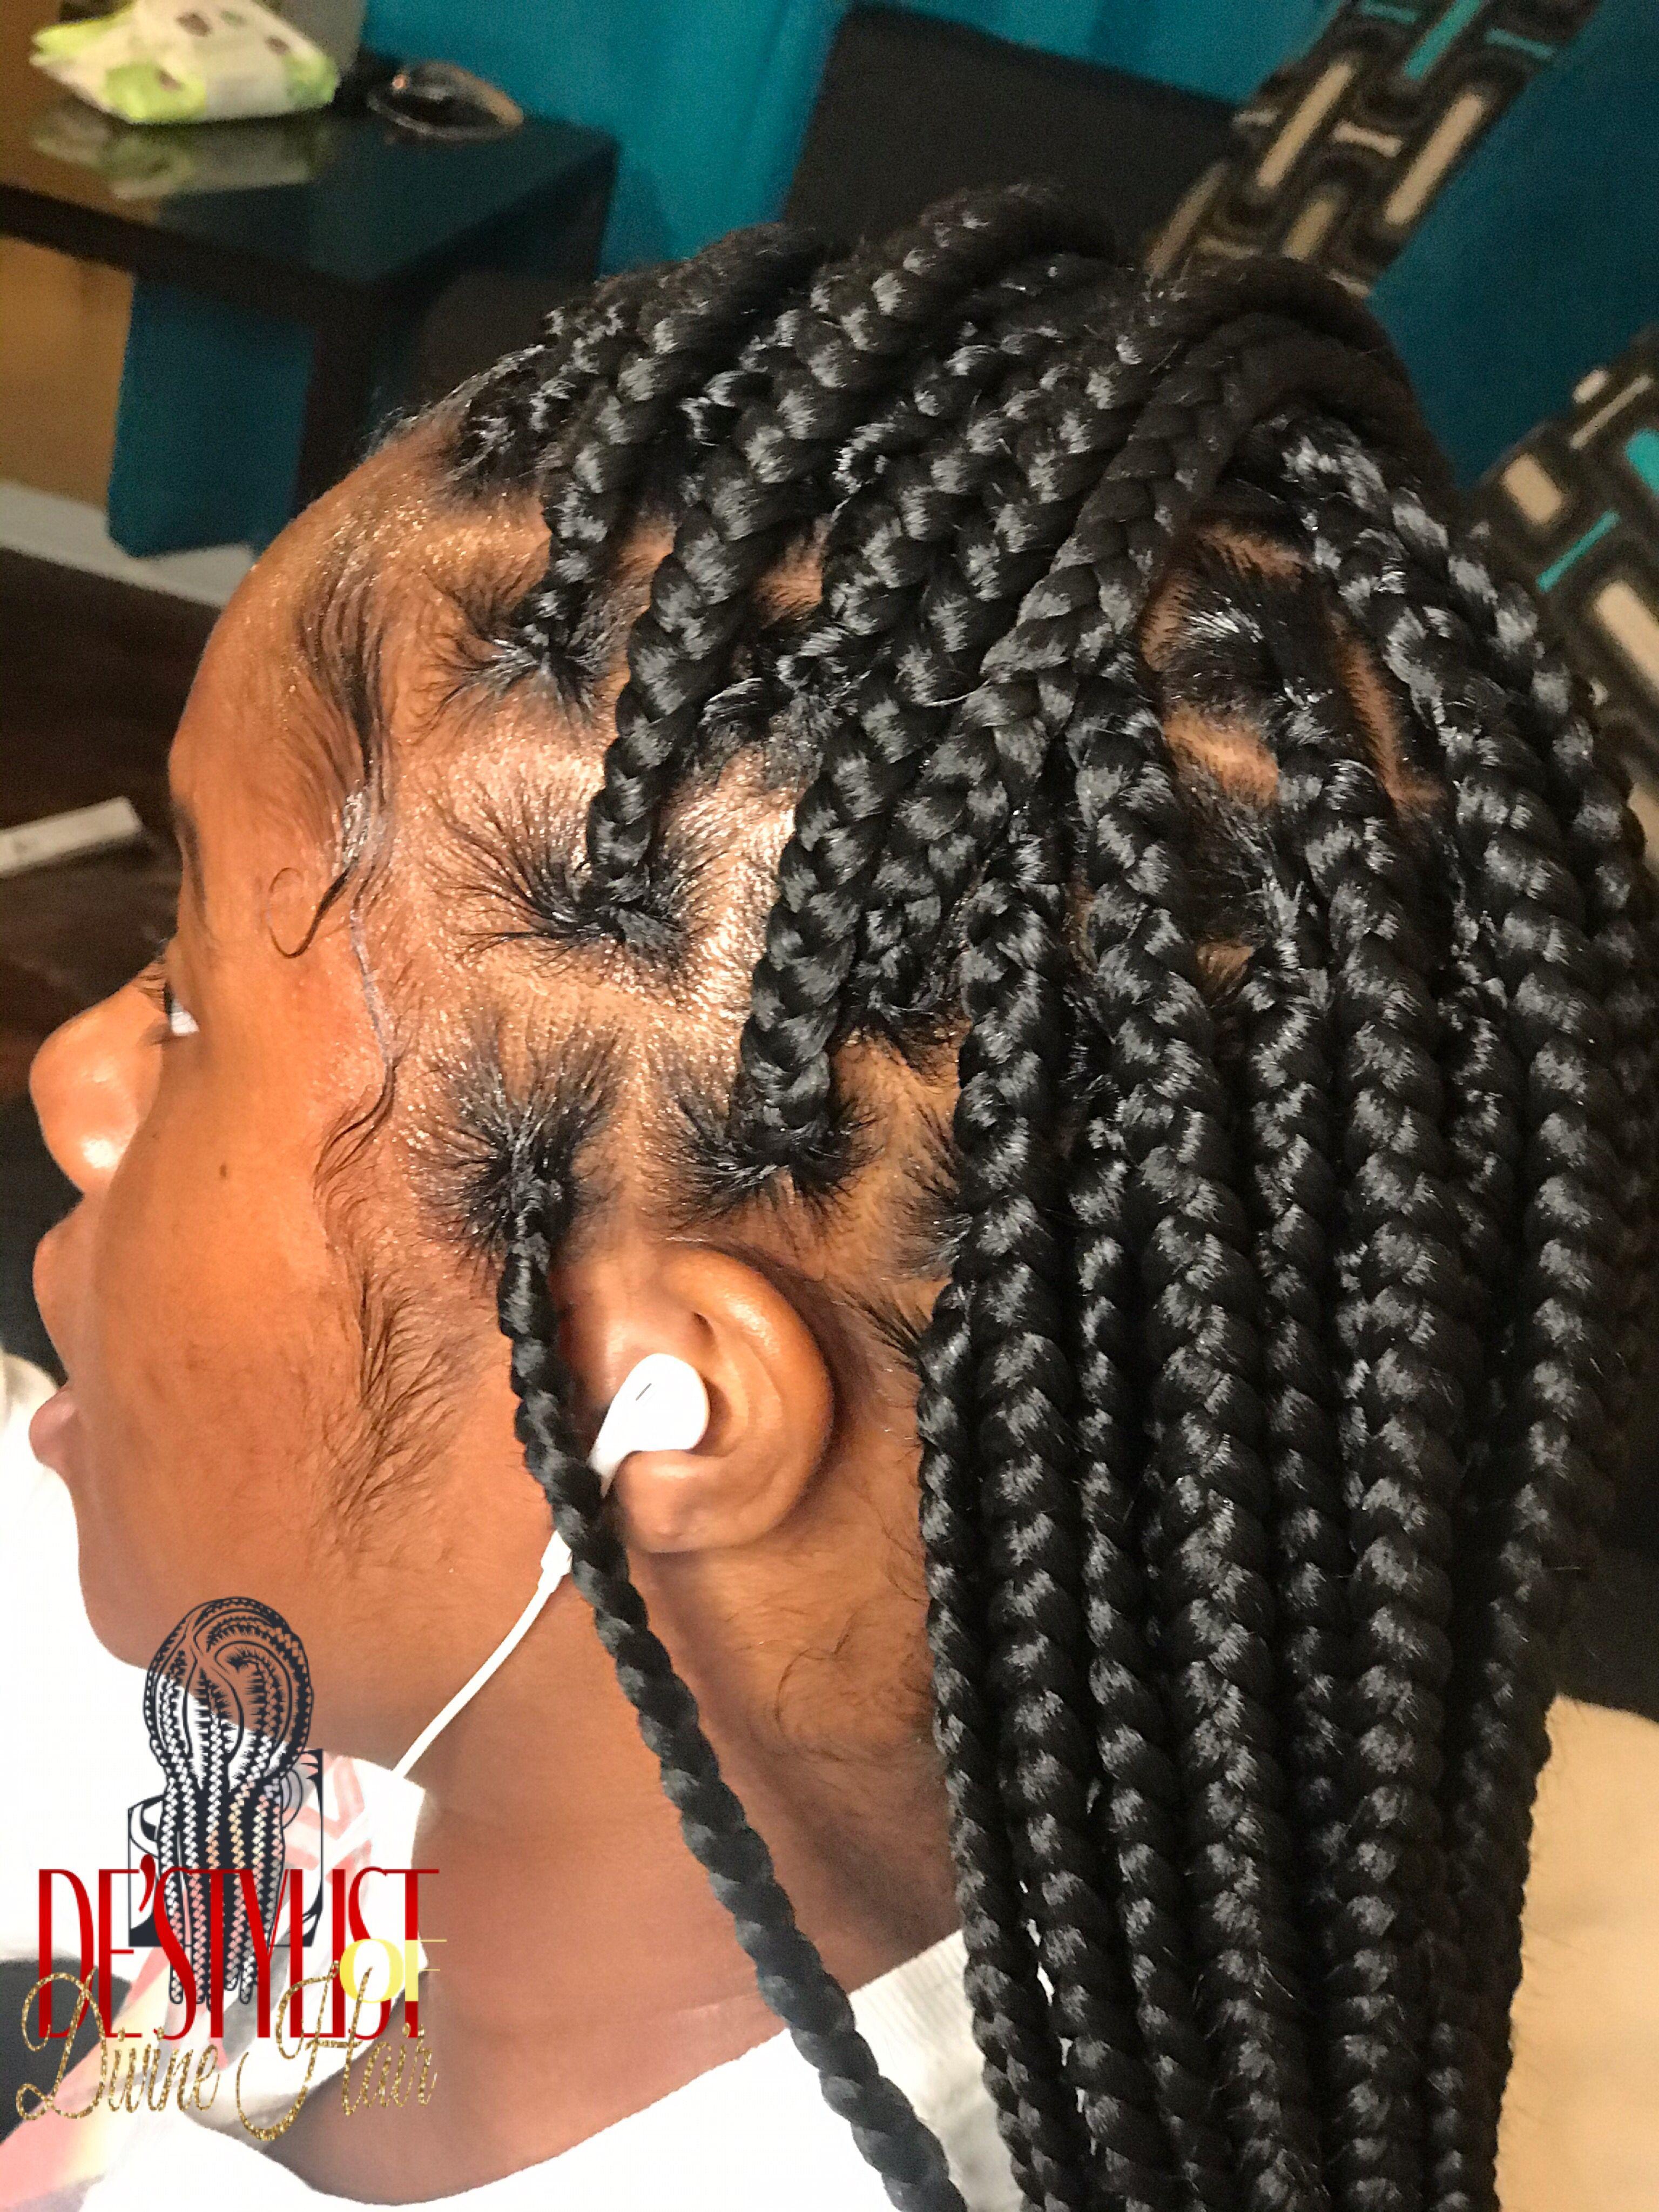 De Stylist Beauty Lounge In Lafayette La In 2020 Twist Braid Hairstyles Feed In Ponytail Black Girl Braided Hairstyles